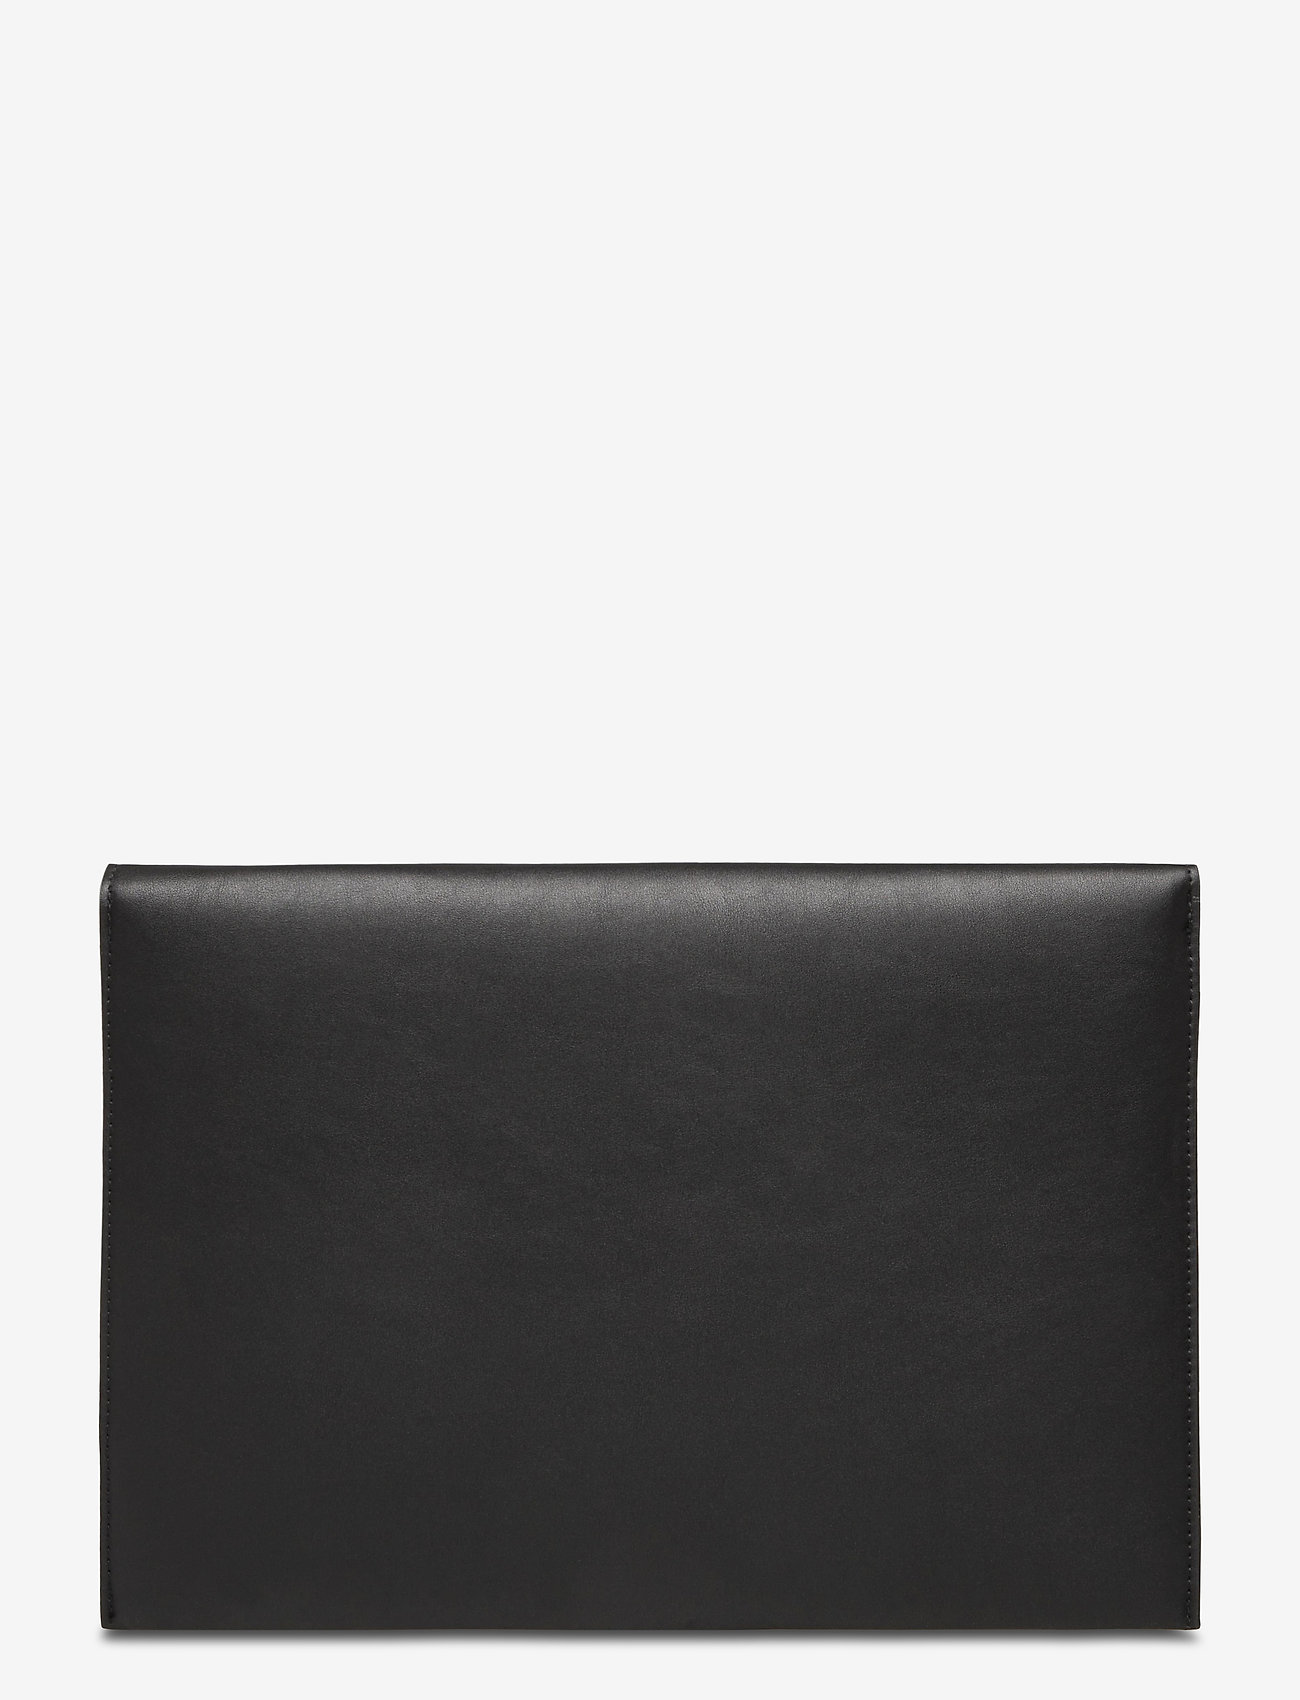 Carin Wester - Alexa computer case - laptoptassen - black 2 - 1